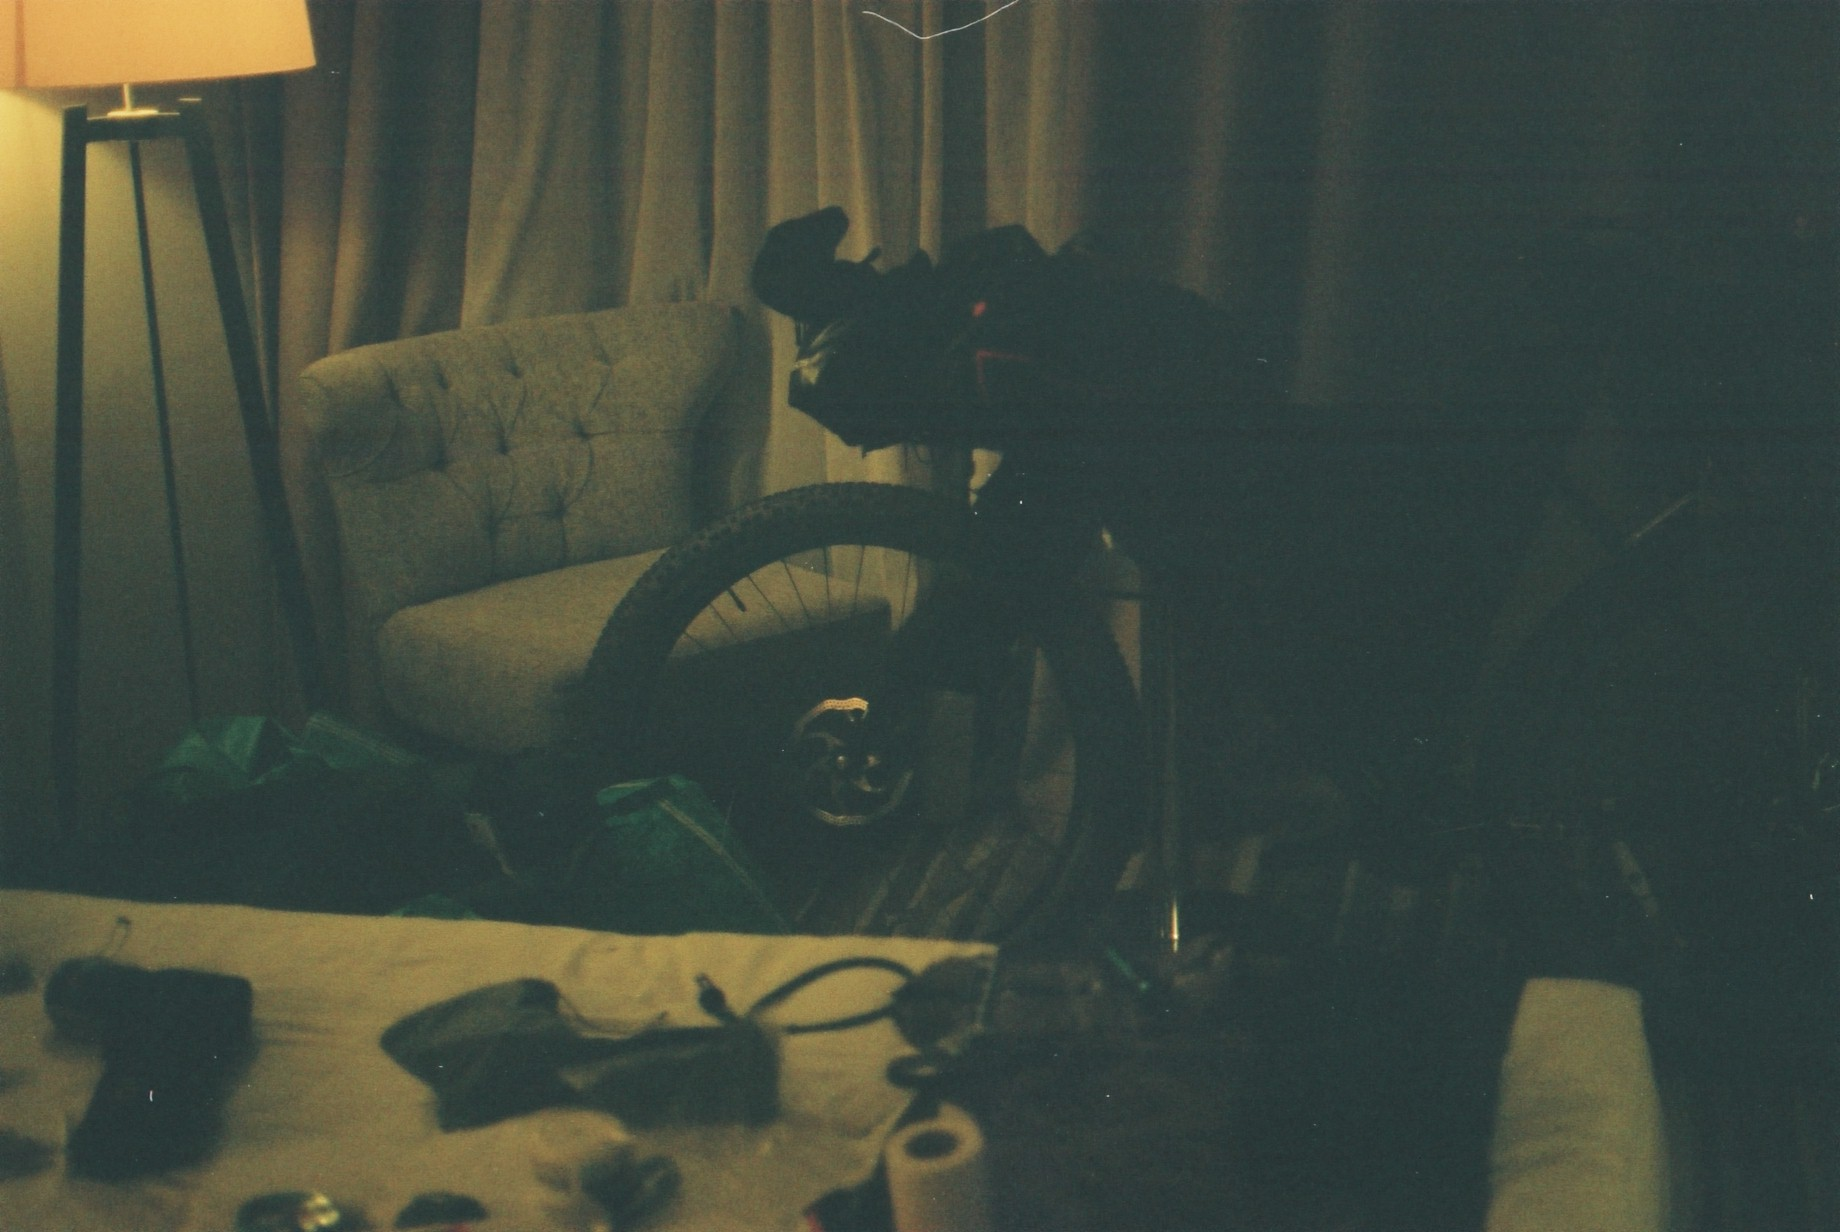 surly, surly ear, surly bikes, bike, building bike, travel, travel blog, blog, explore, jack macgowan, film photography, photography blog, bikepacking